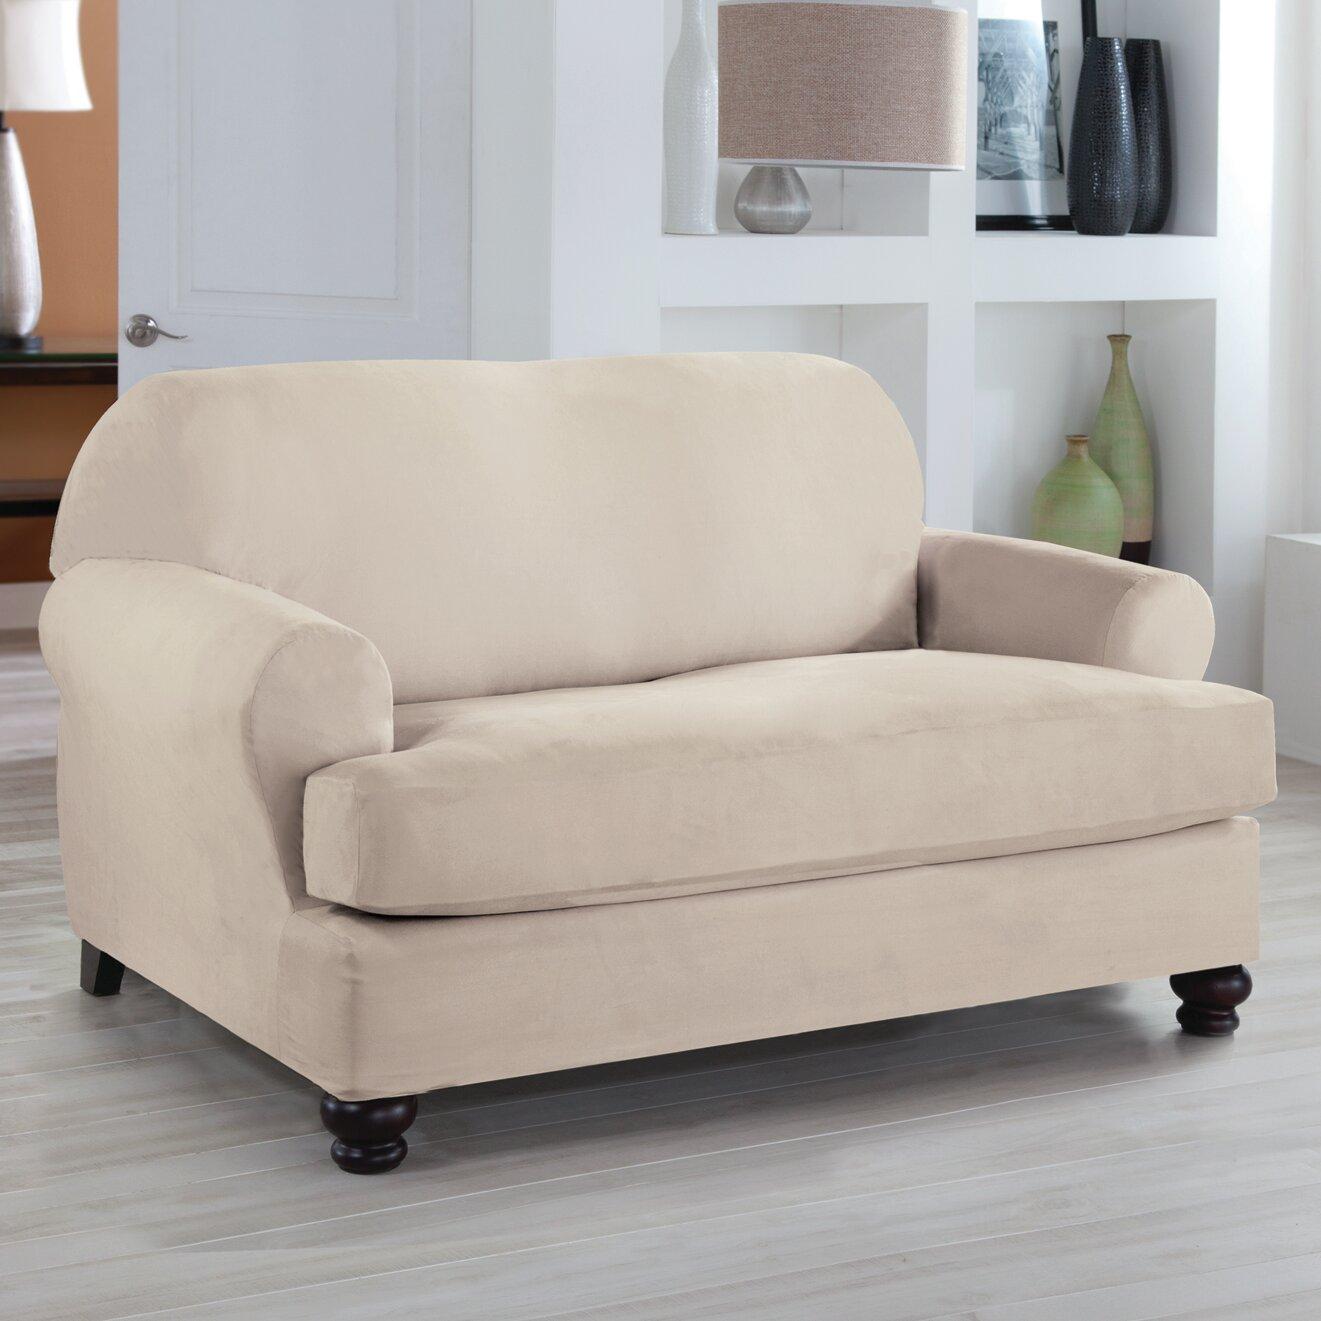 Tailor Fit Loveseat T Cushion Slipcover Wayfair